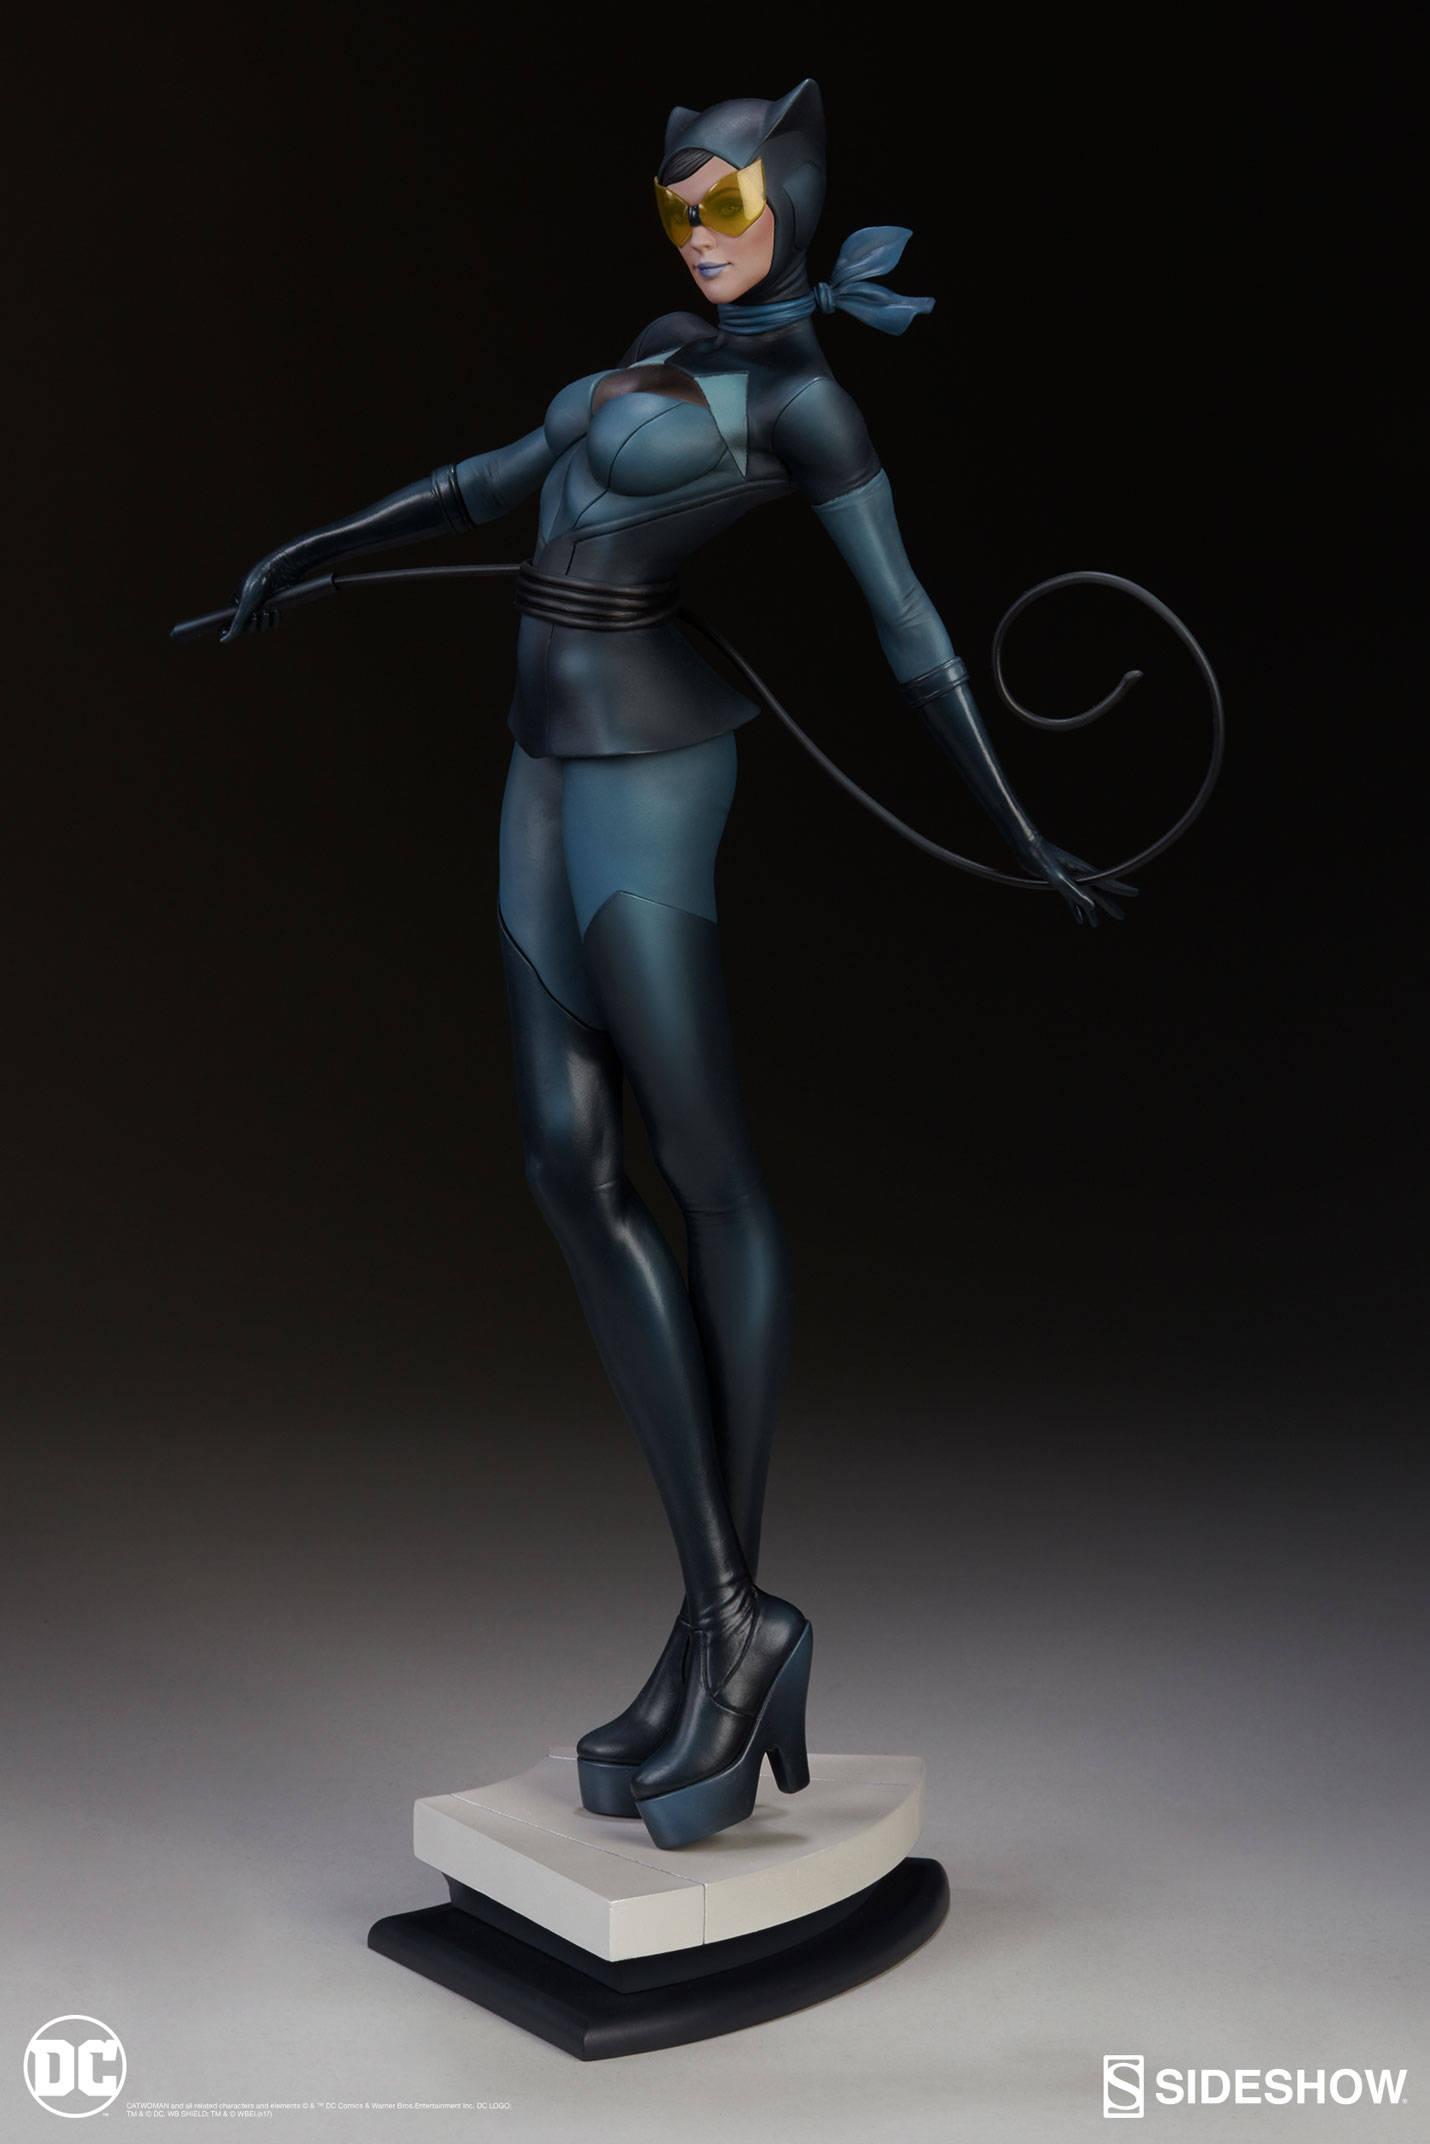 Catwoman-Sideshow-Artgerm-Statue02